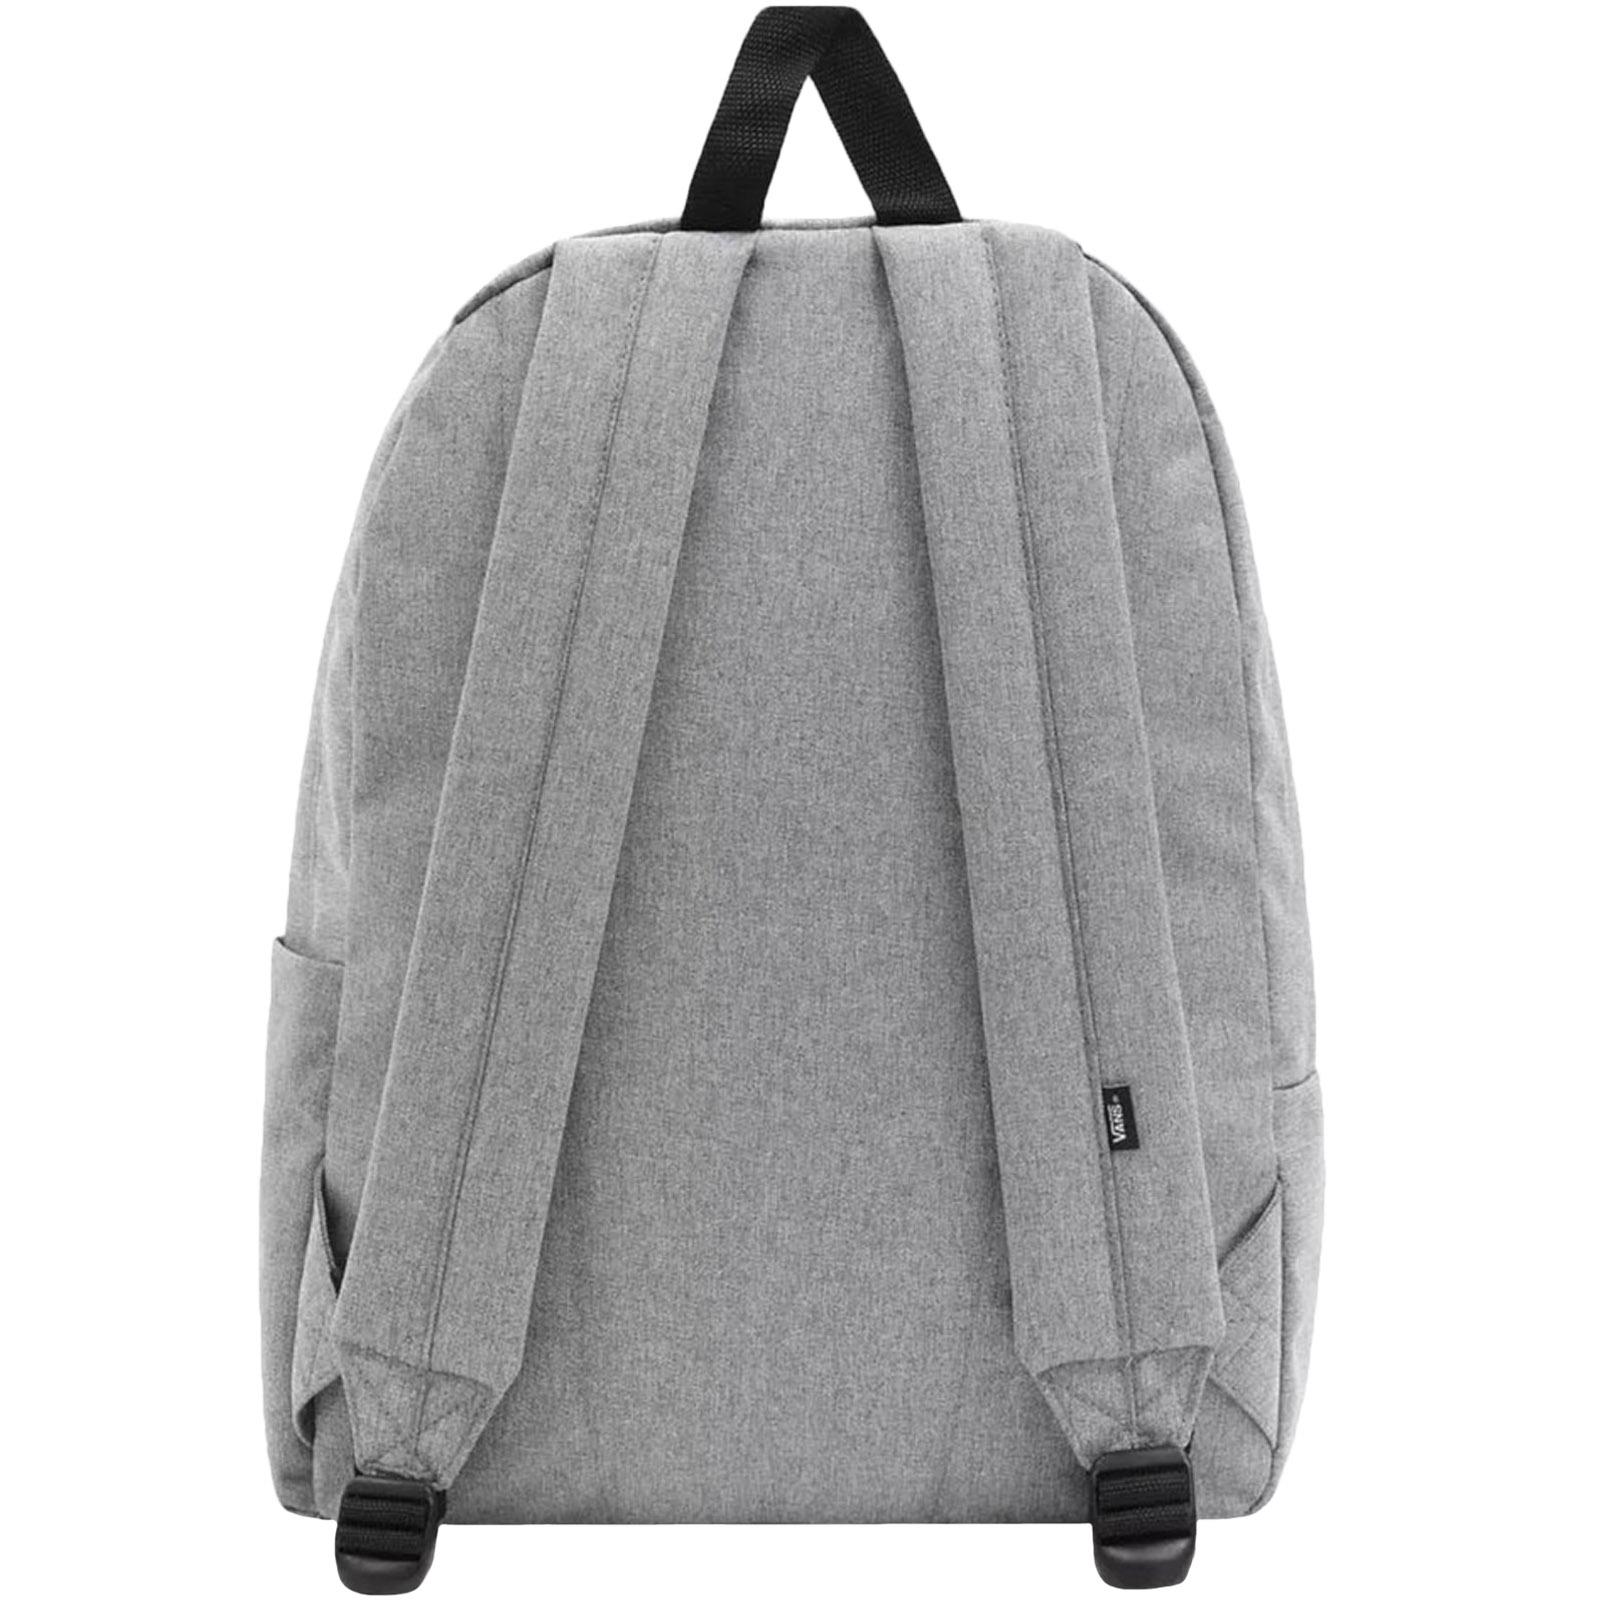 thumbnail 7 - Vans Unisex Old Skool III Adjustable Strap School Travel Rucksack Backpack Bag